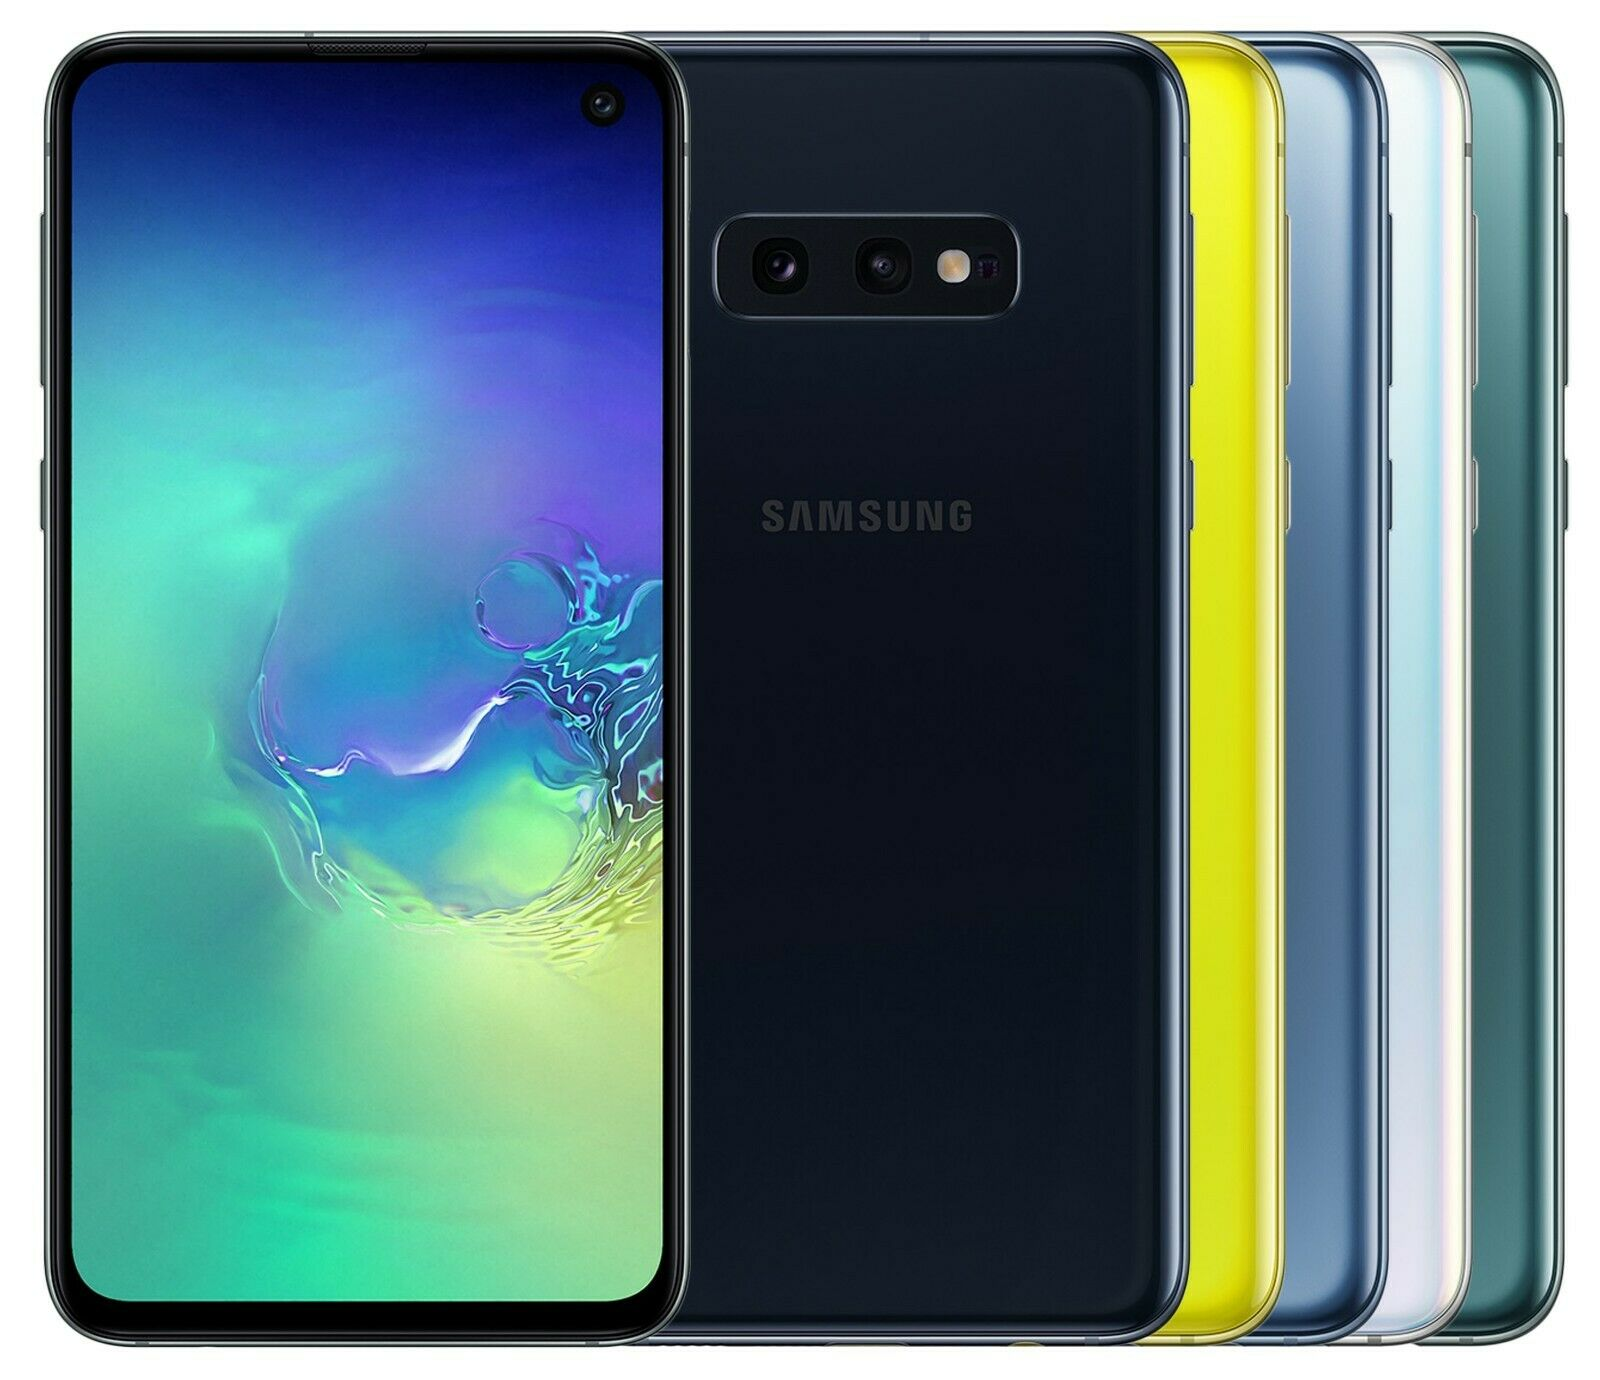 "Android Phone - Samsung Galaxy S10e 128GB SM-G970F/DS Dual Sim (FACTORY UNLOCKED) 5.8"" 6GB RAM"